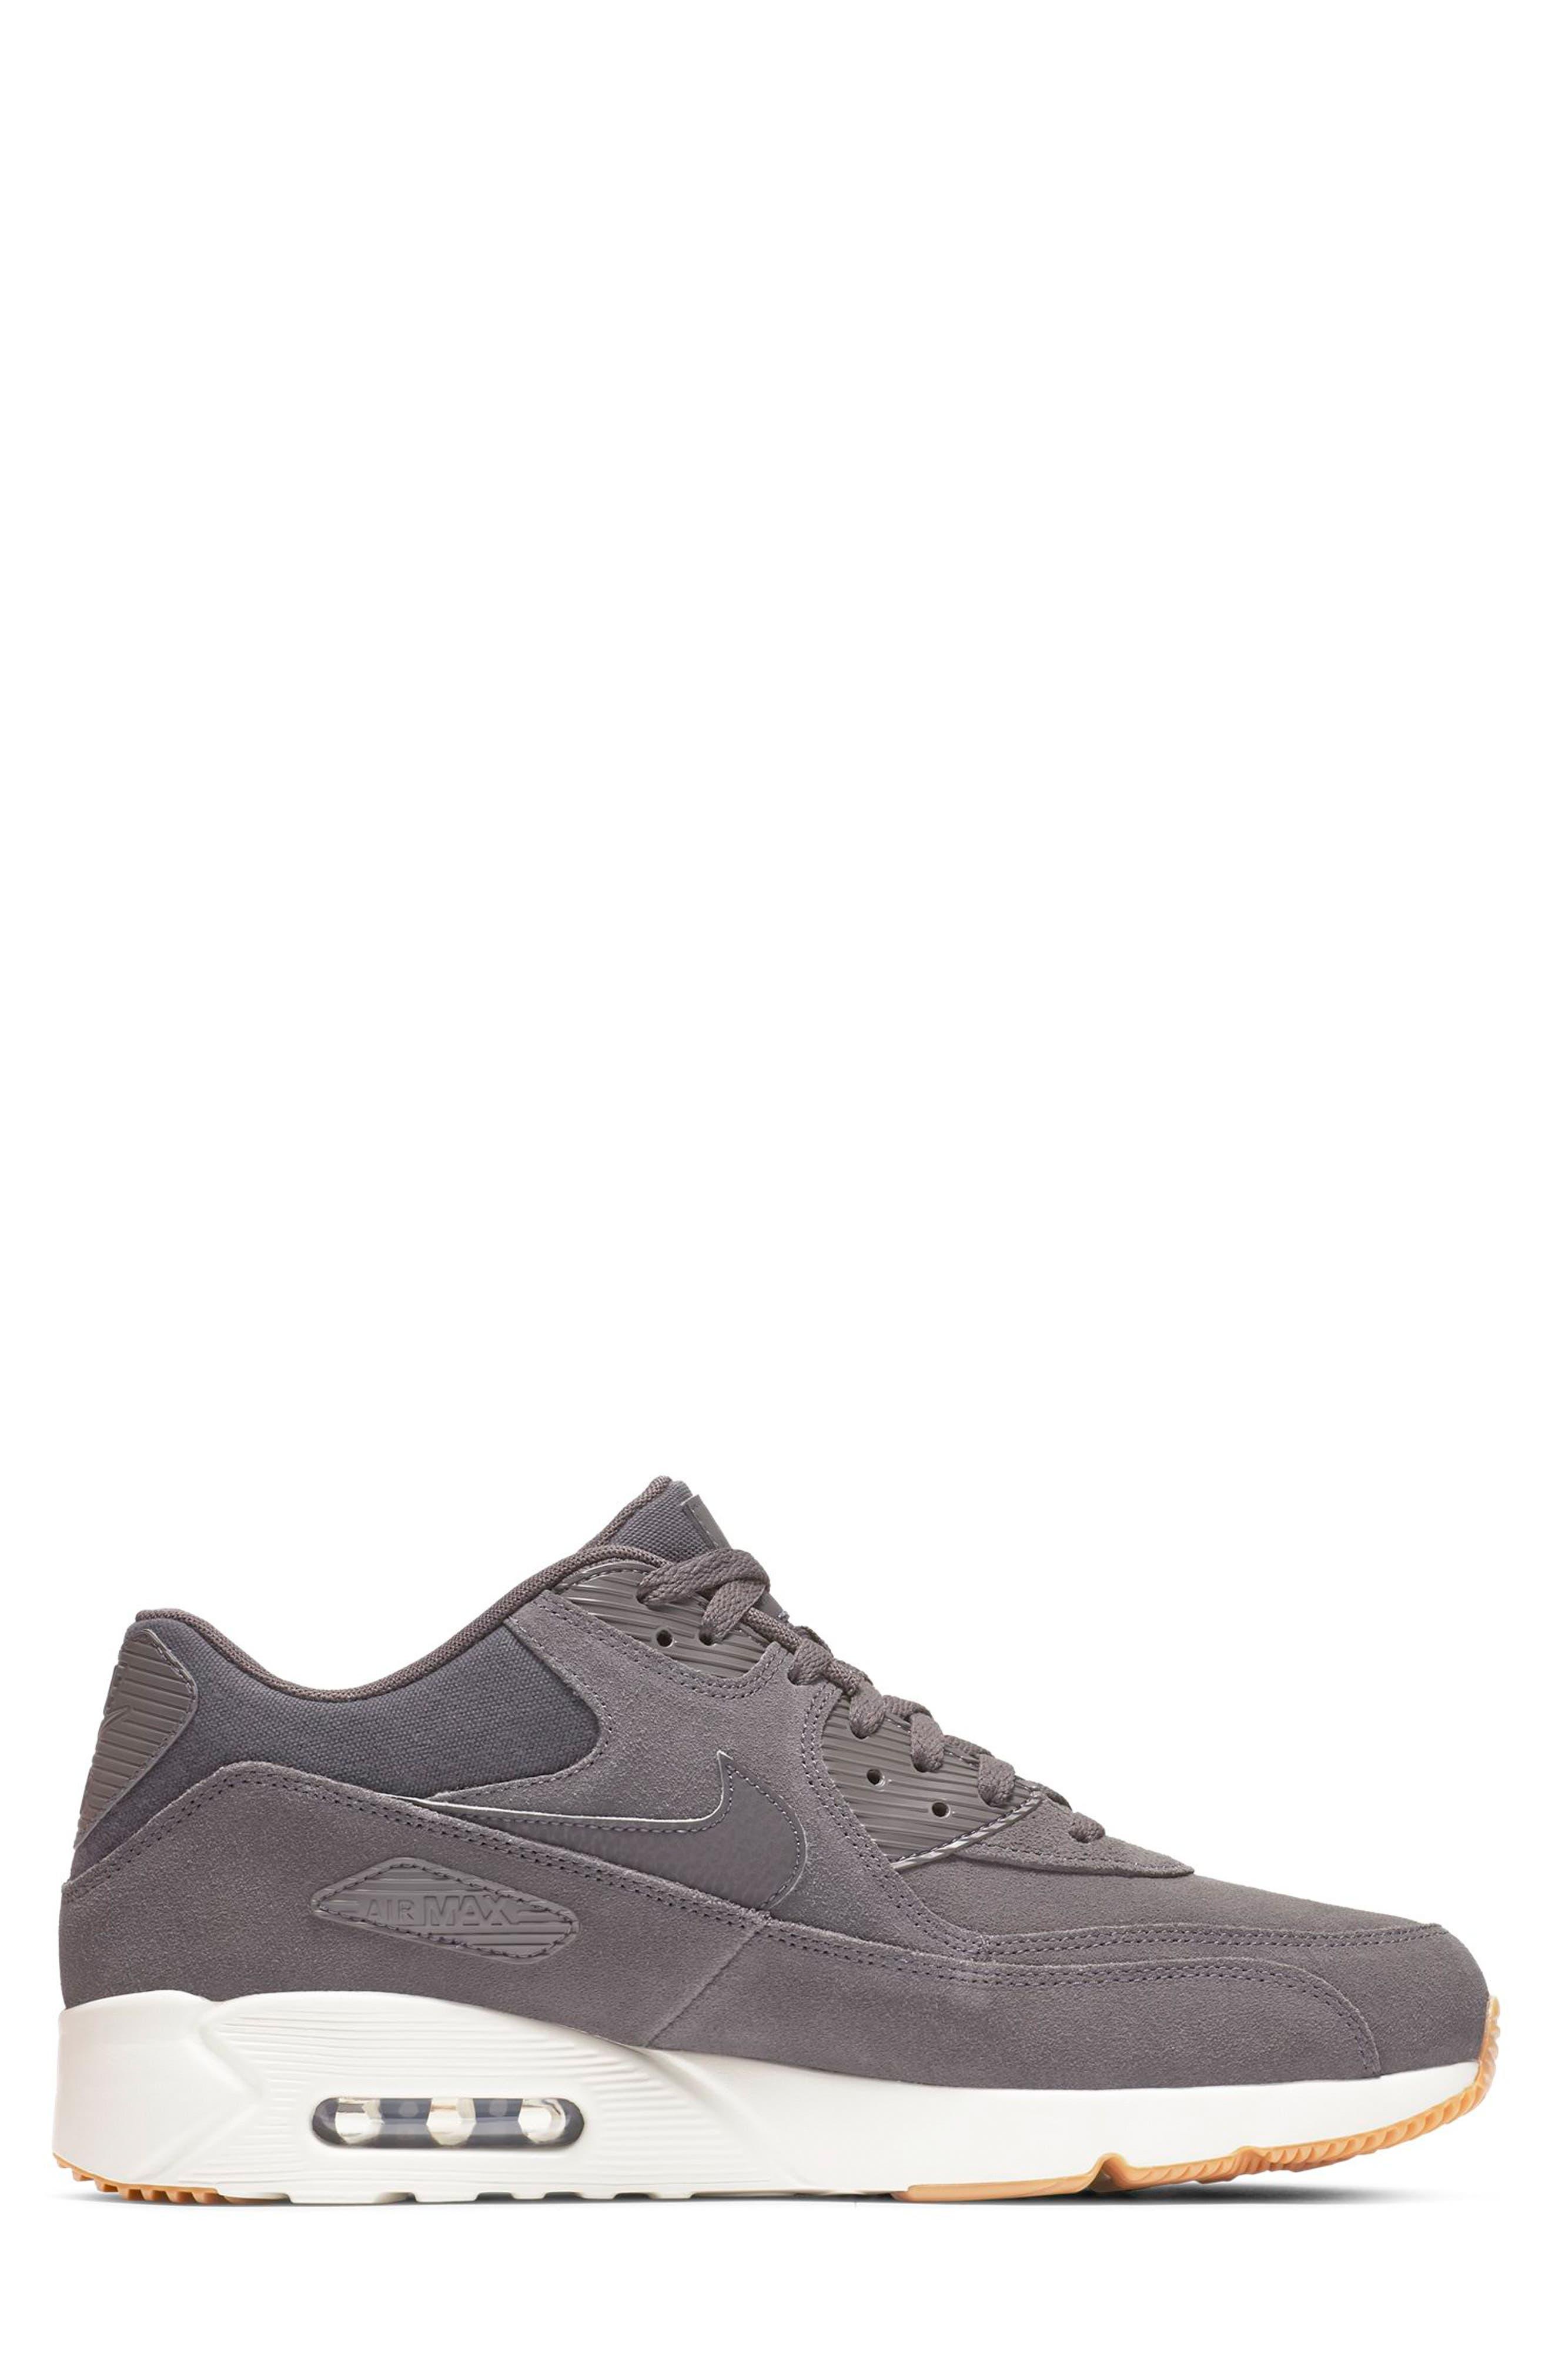 Air Max 90 Ultra 2.0 Sneaker,                             Alternate thumbnail 2, color,                             THUNDER GREY/ GREY/ LIGHT BONE